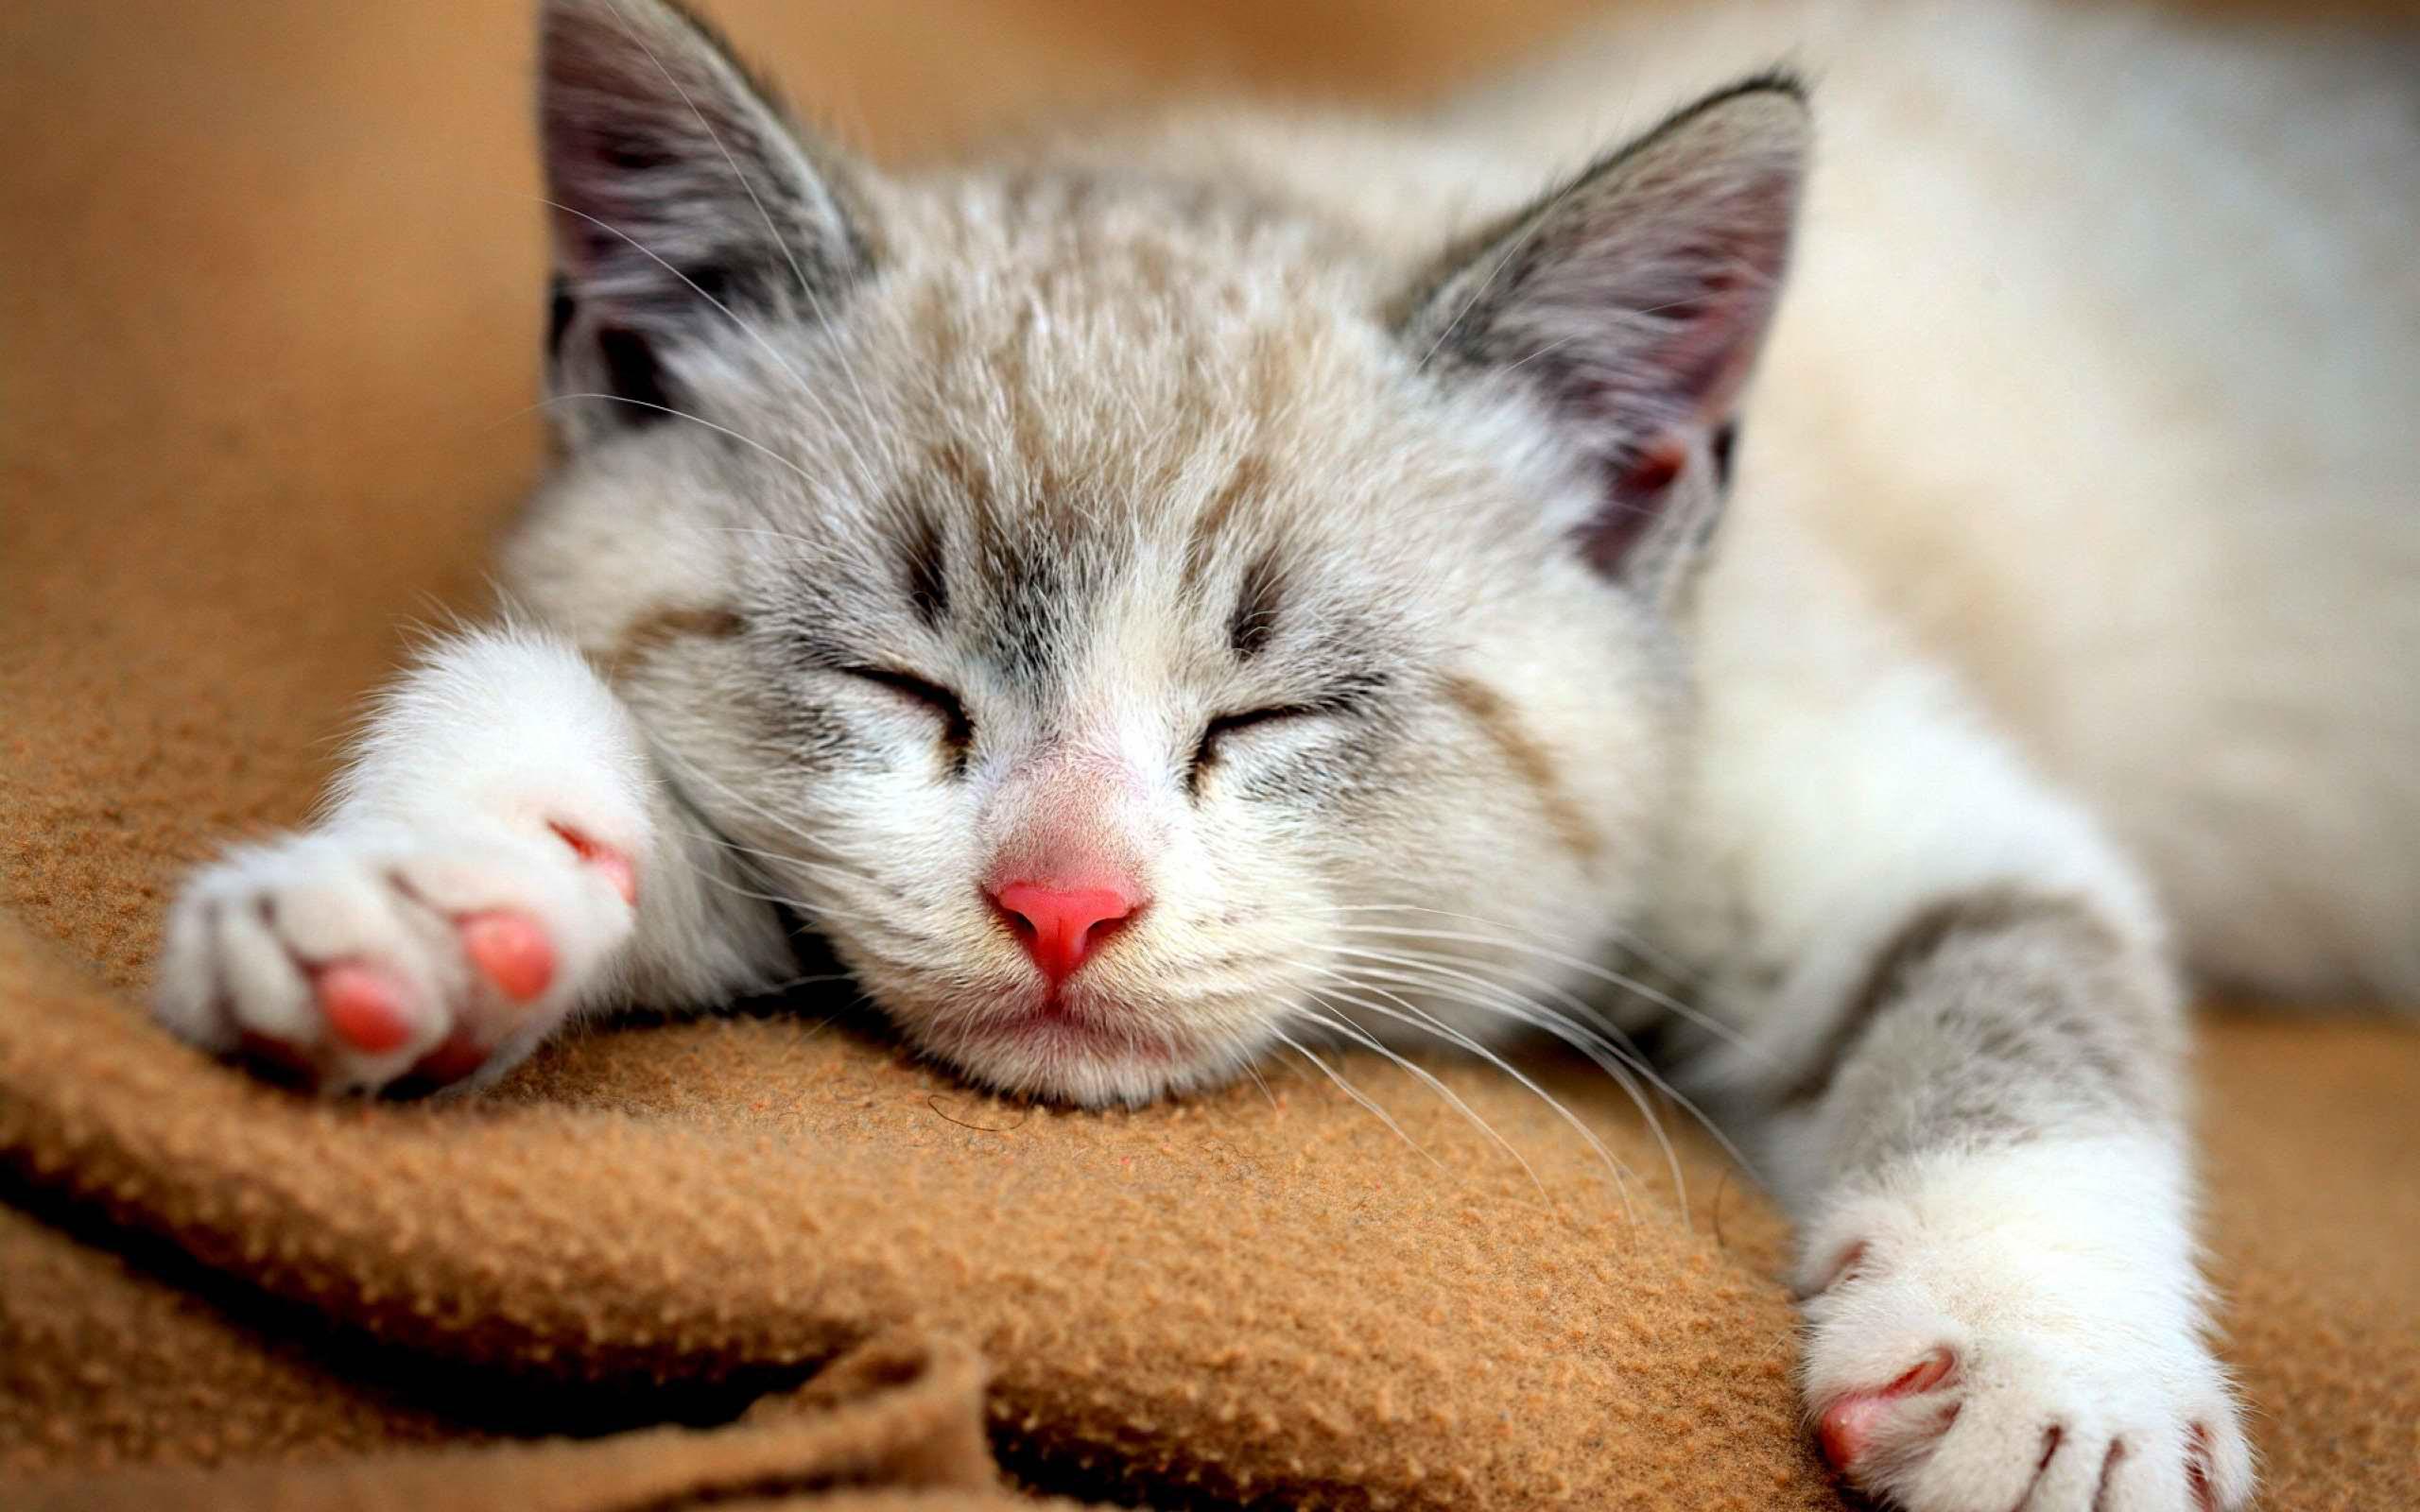 Cute Cat Pictures Tumblr Wallpaper 2606 Best Wallpapers Cute Cat 2560x1600